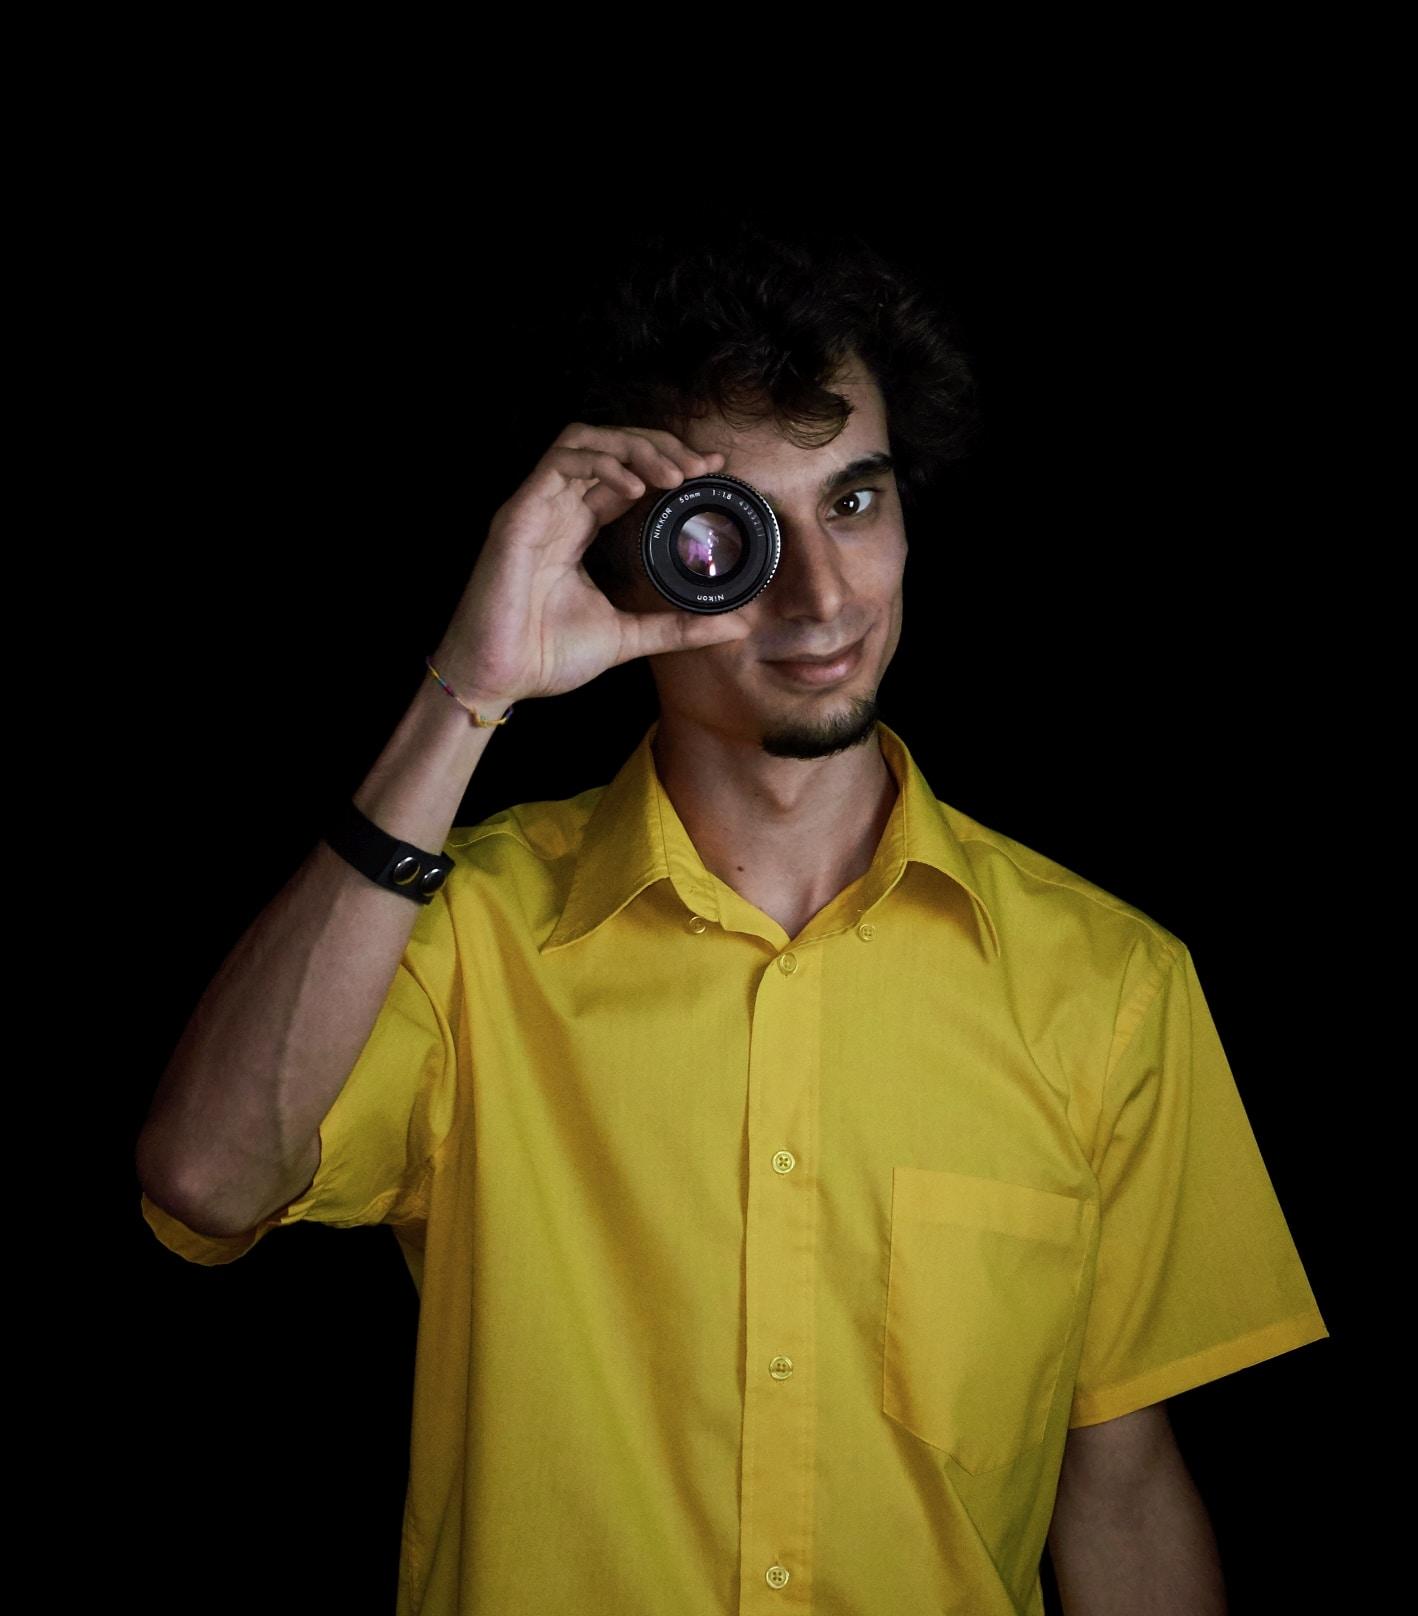 Go to Marco Djallo's profile